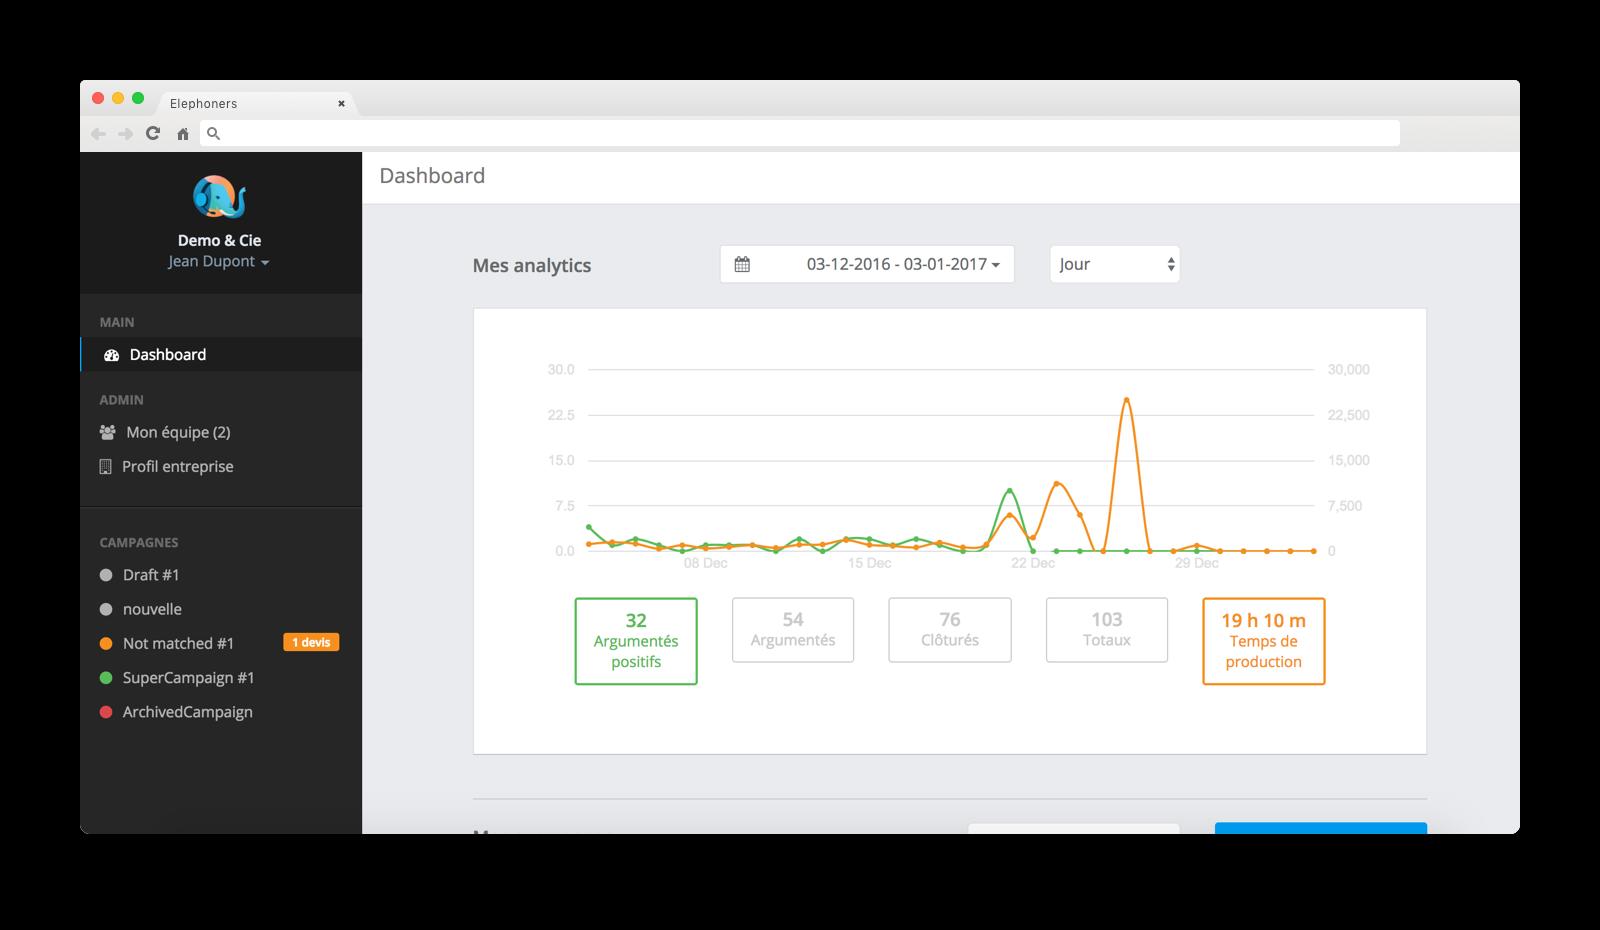 elephoners startup dashboard